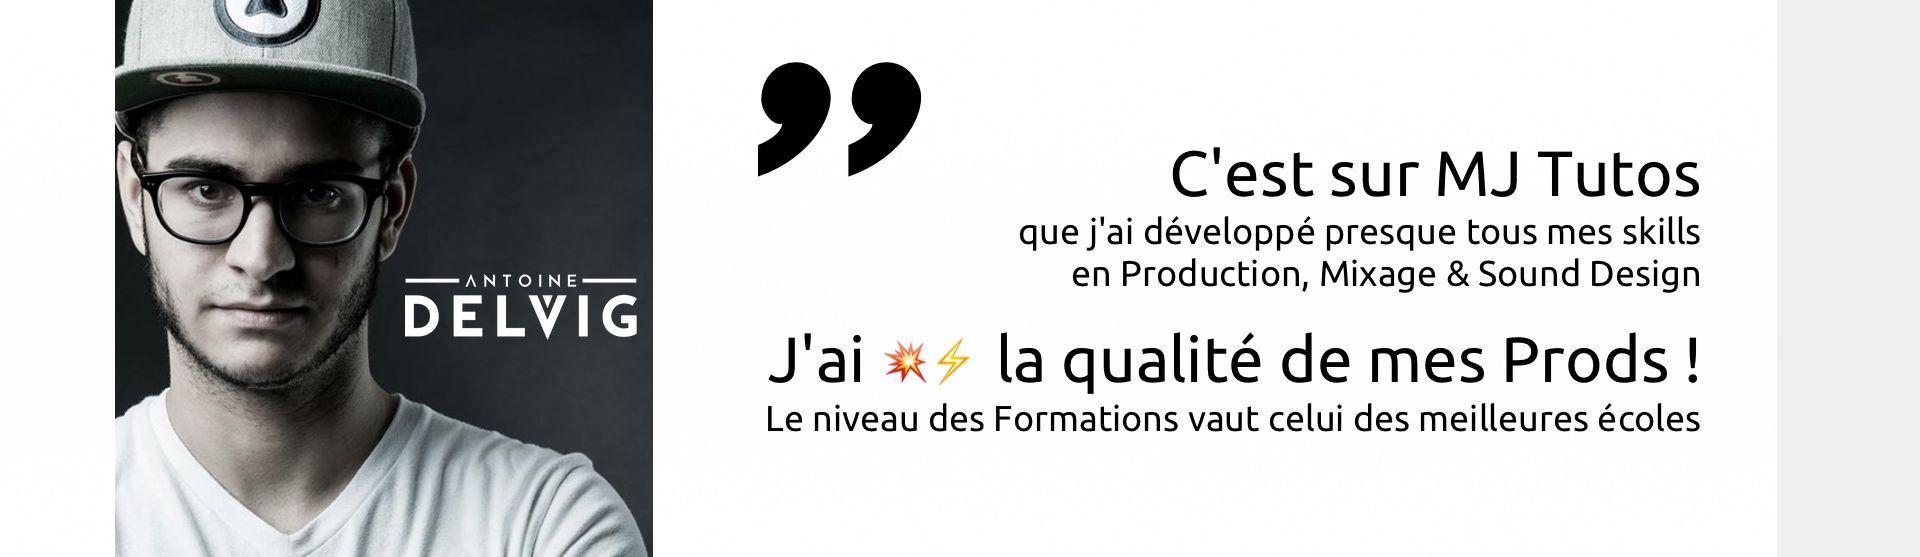 Antoine Delvig <span>recommande MJ Tutoriels</span>